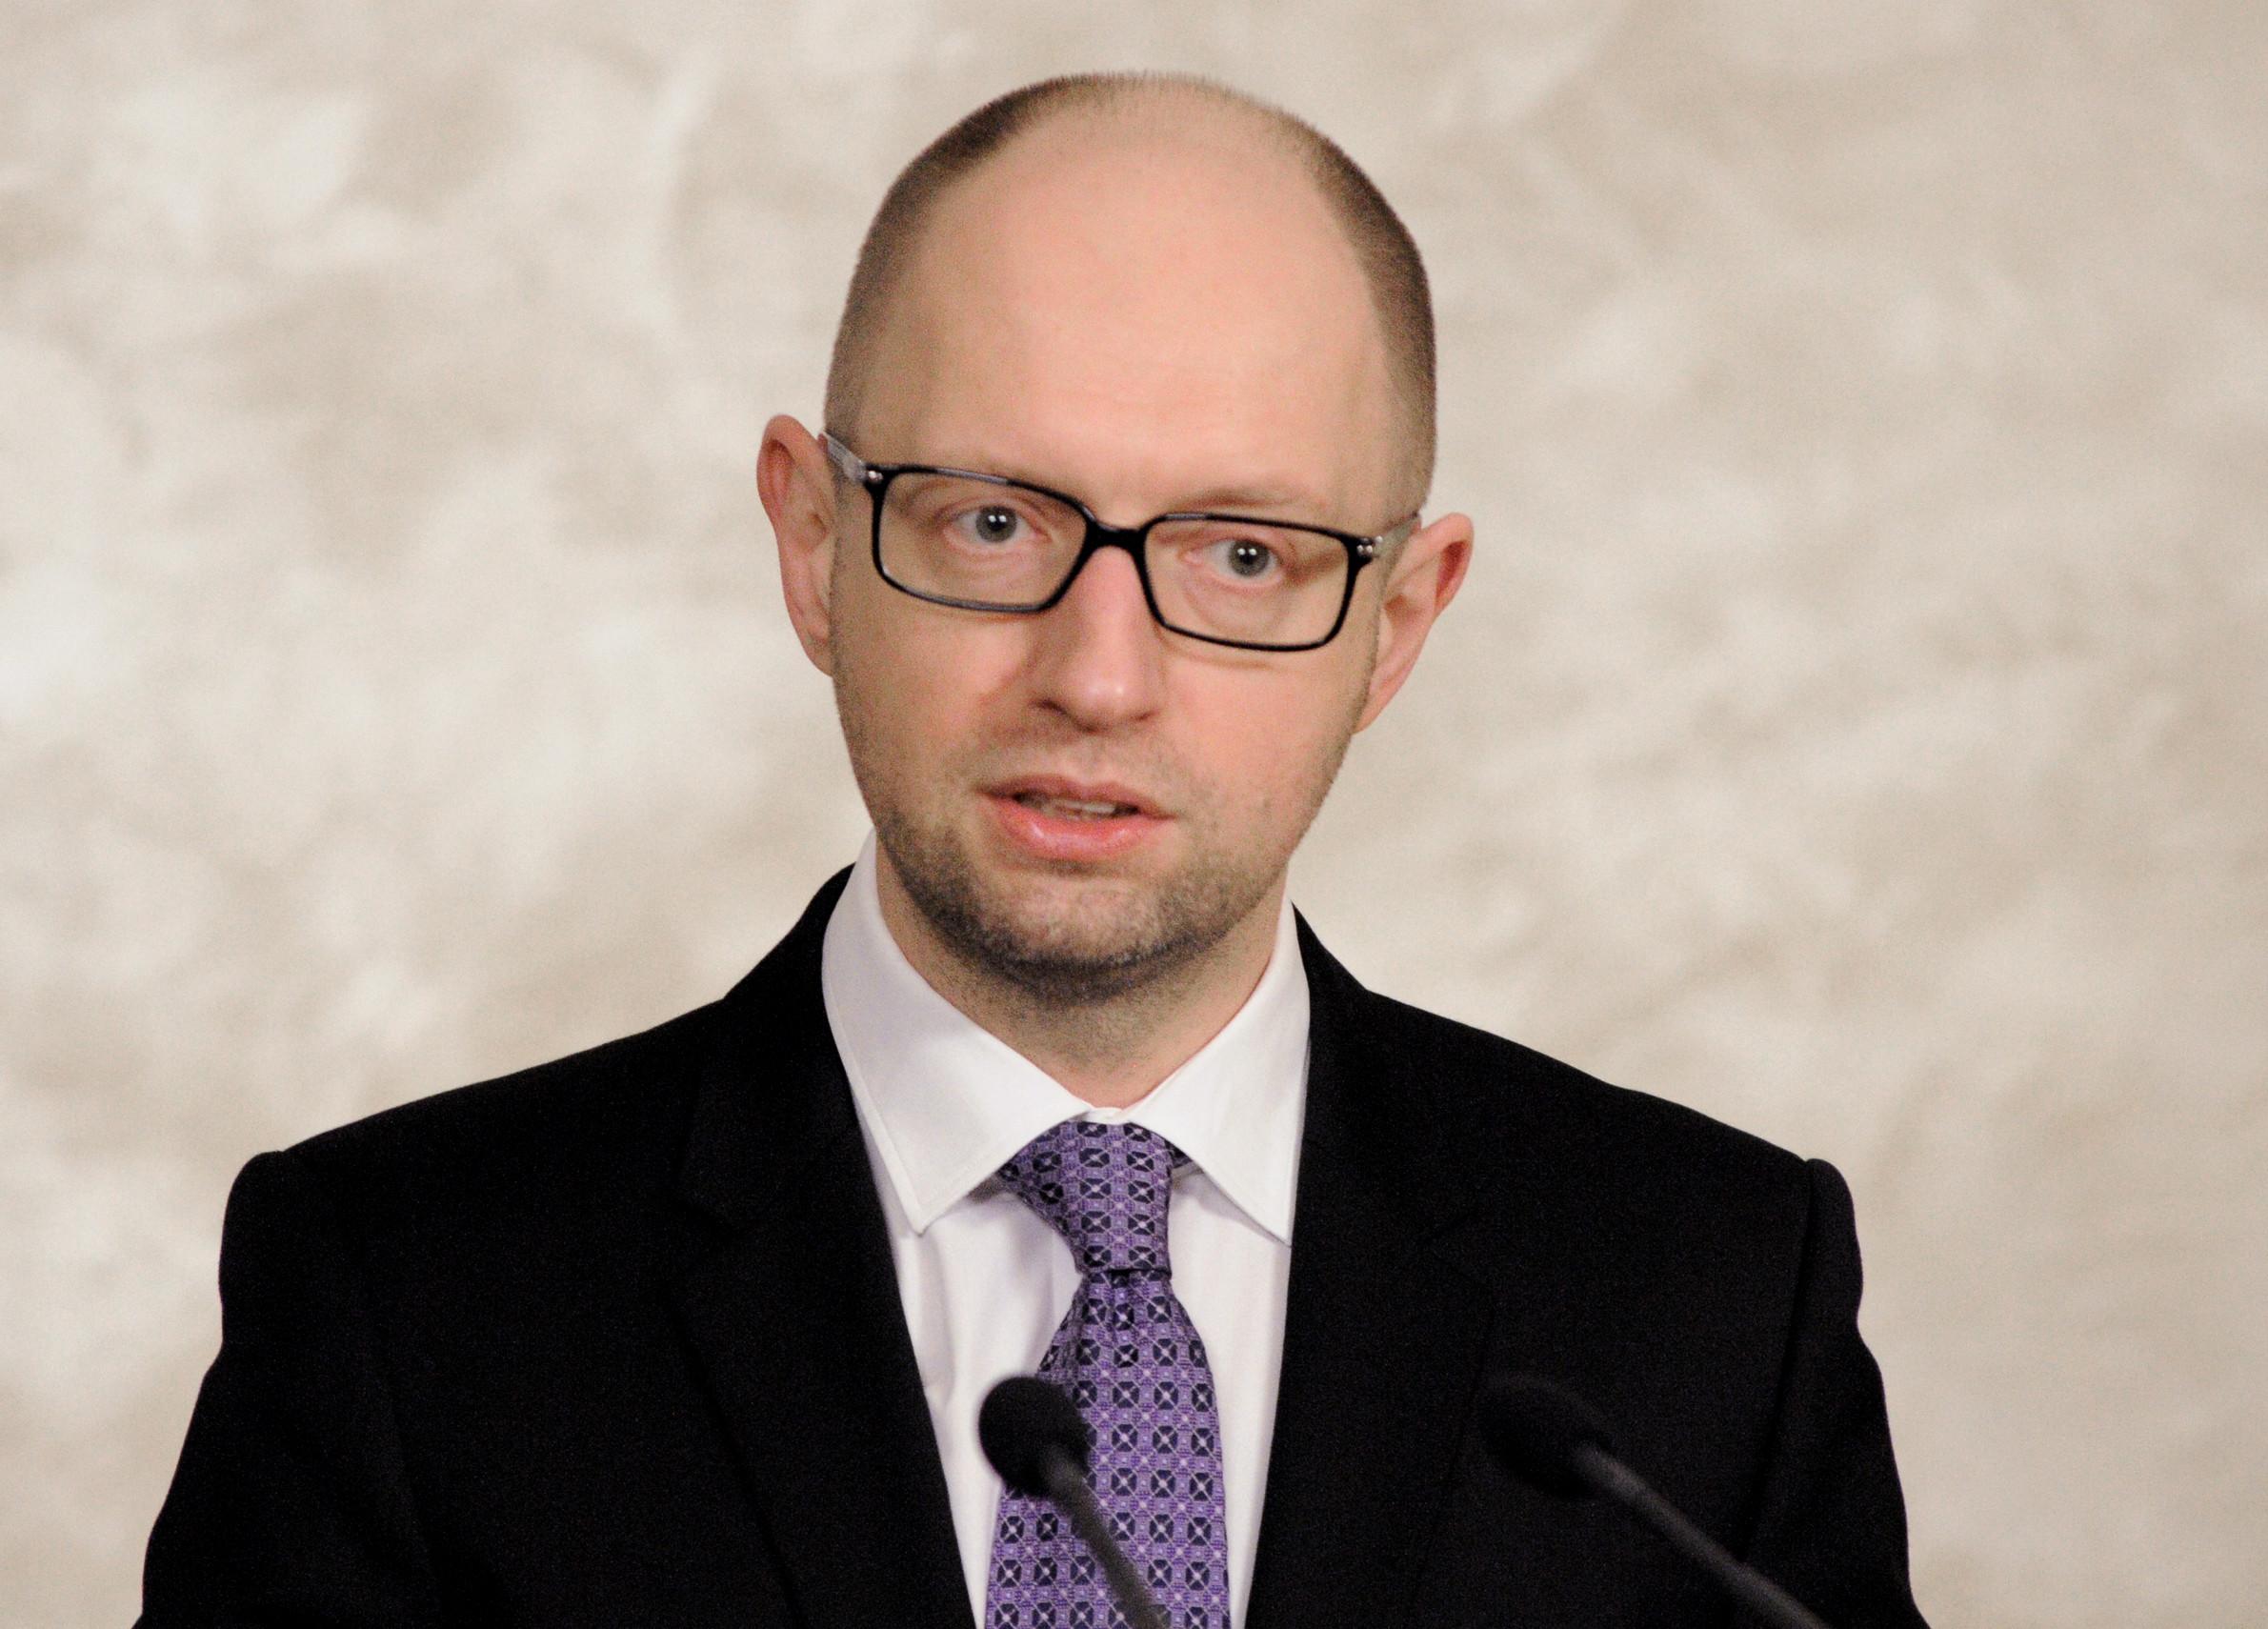 <p>Арсений Яценюк. Фото: &copy;РИА Новости/Александр Максименко</p>